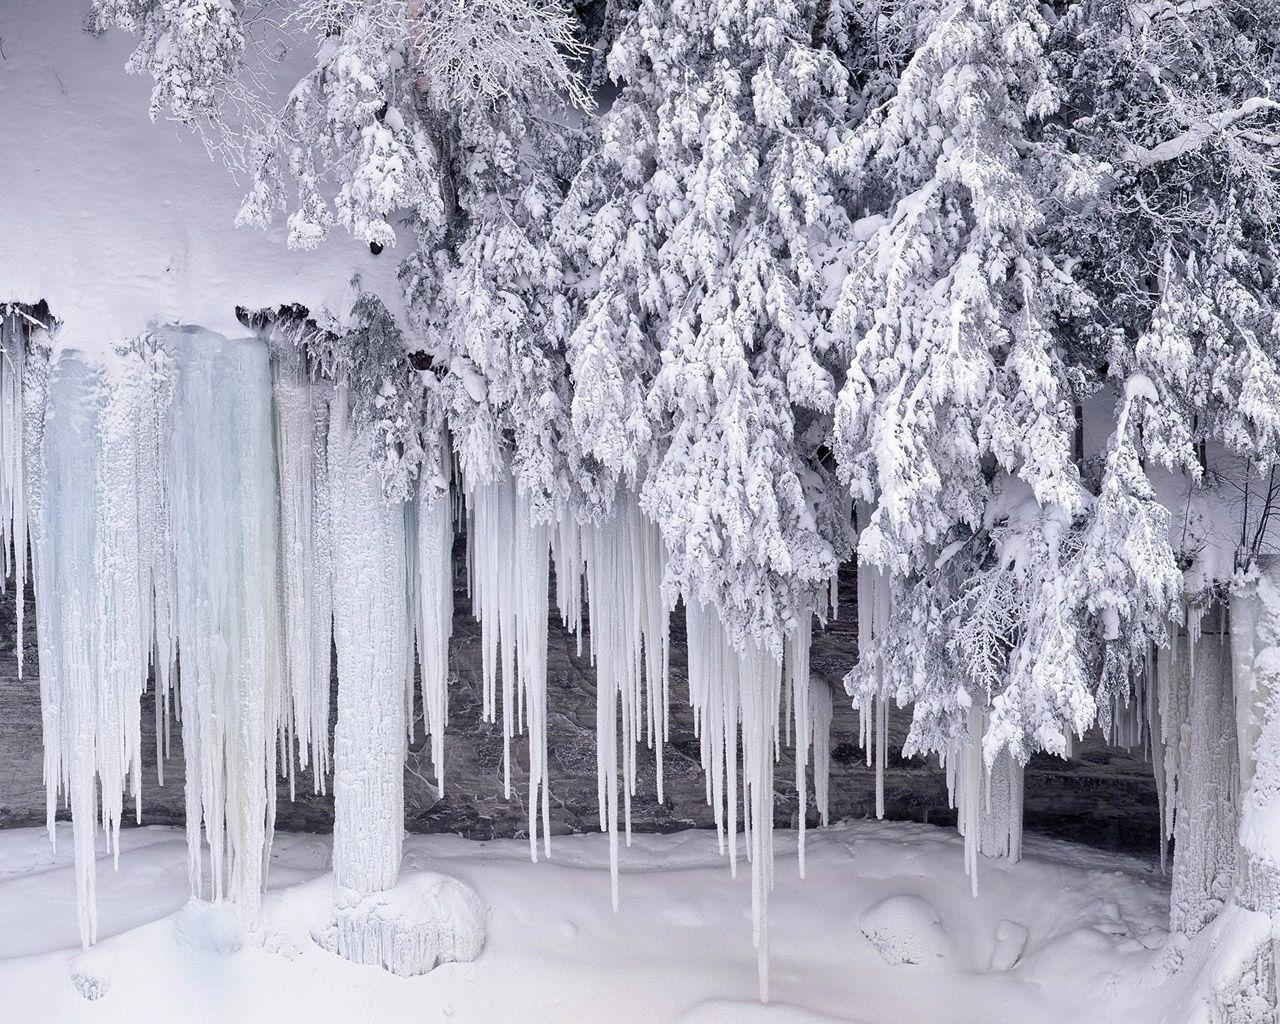 winter snow scenes wallpapers wallpaper | hd wallpapers | pinterest